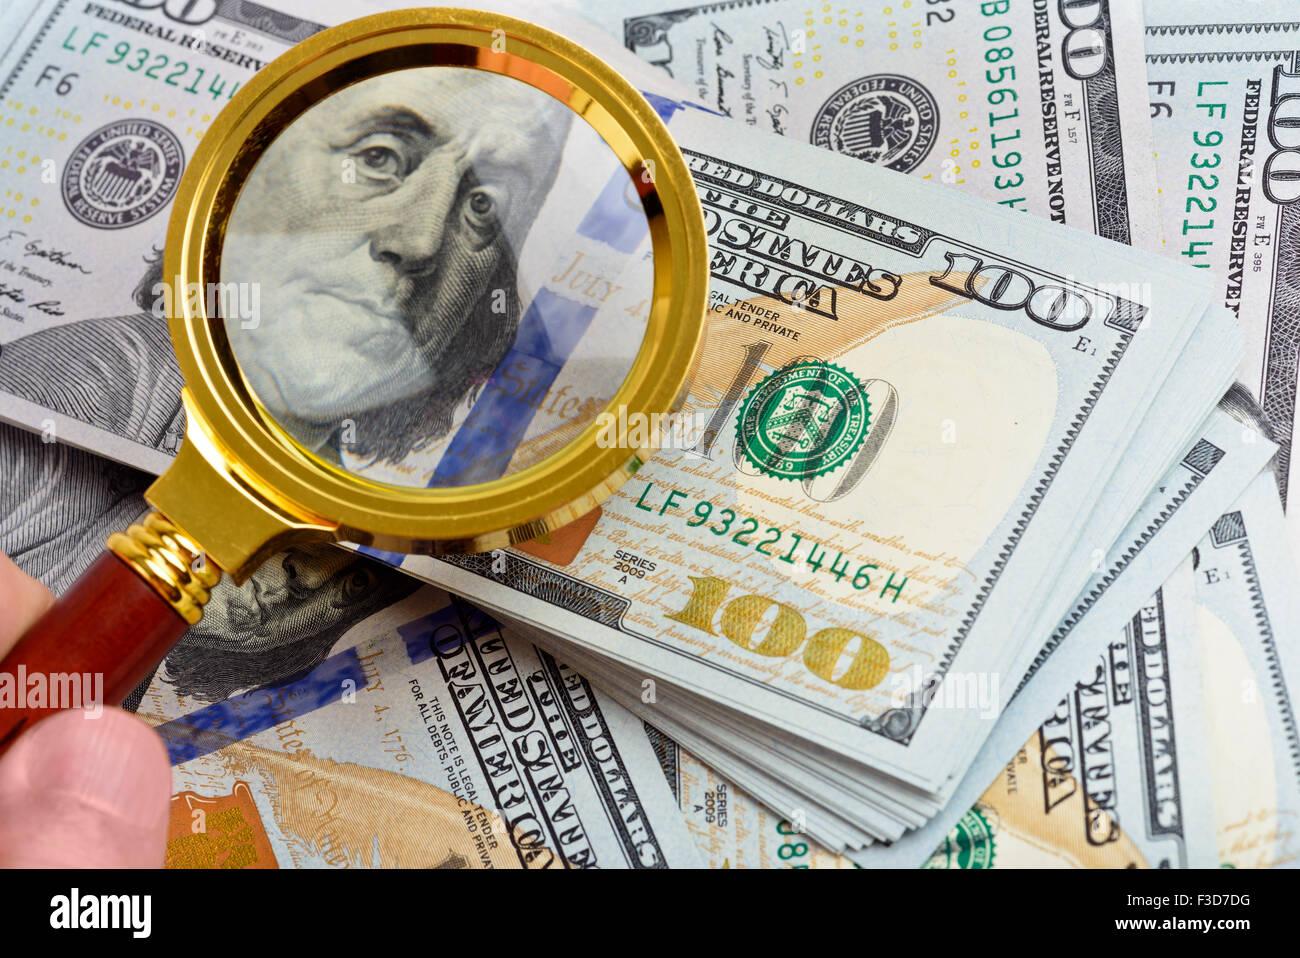 Hundred dollar banknotes under magnifying glass - Stock Image